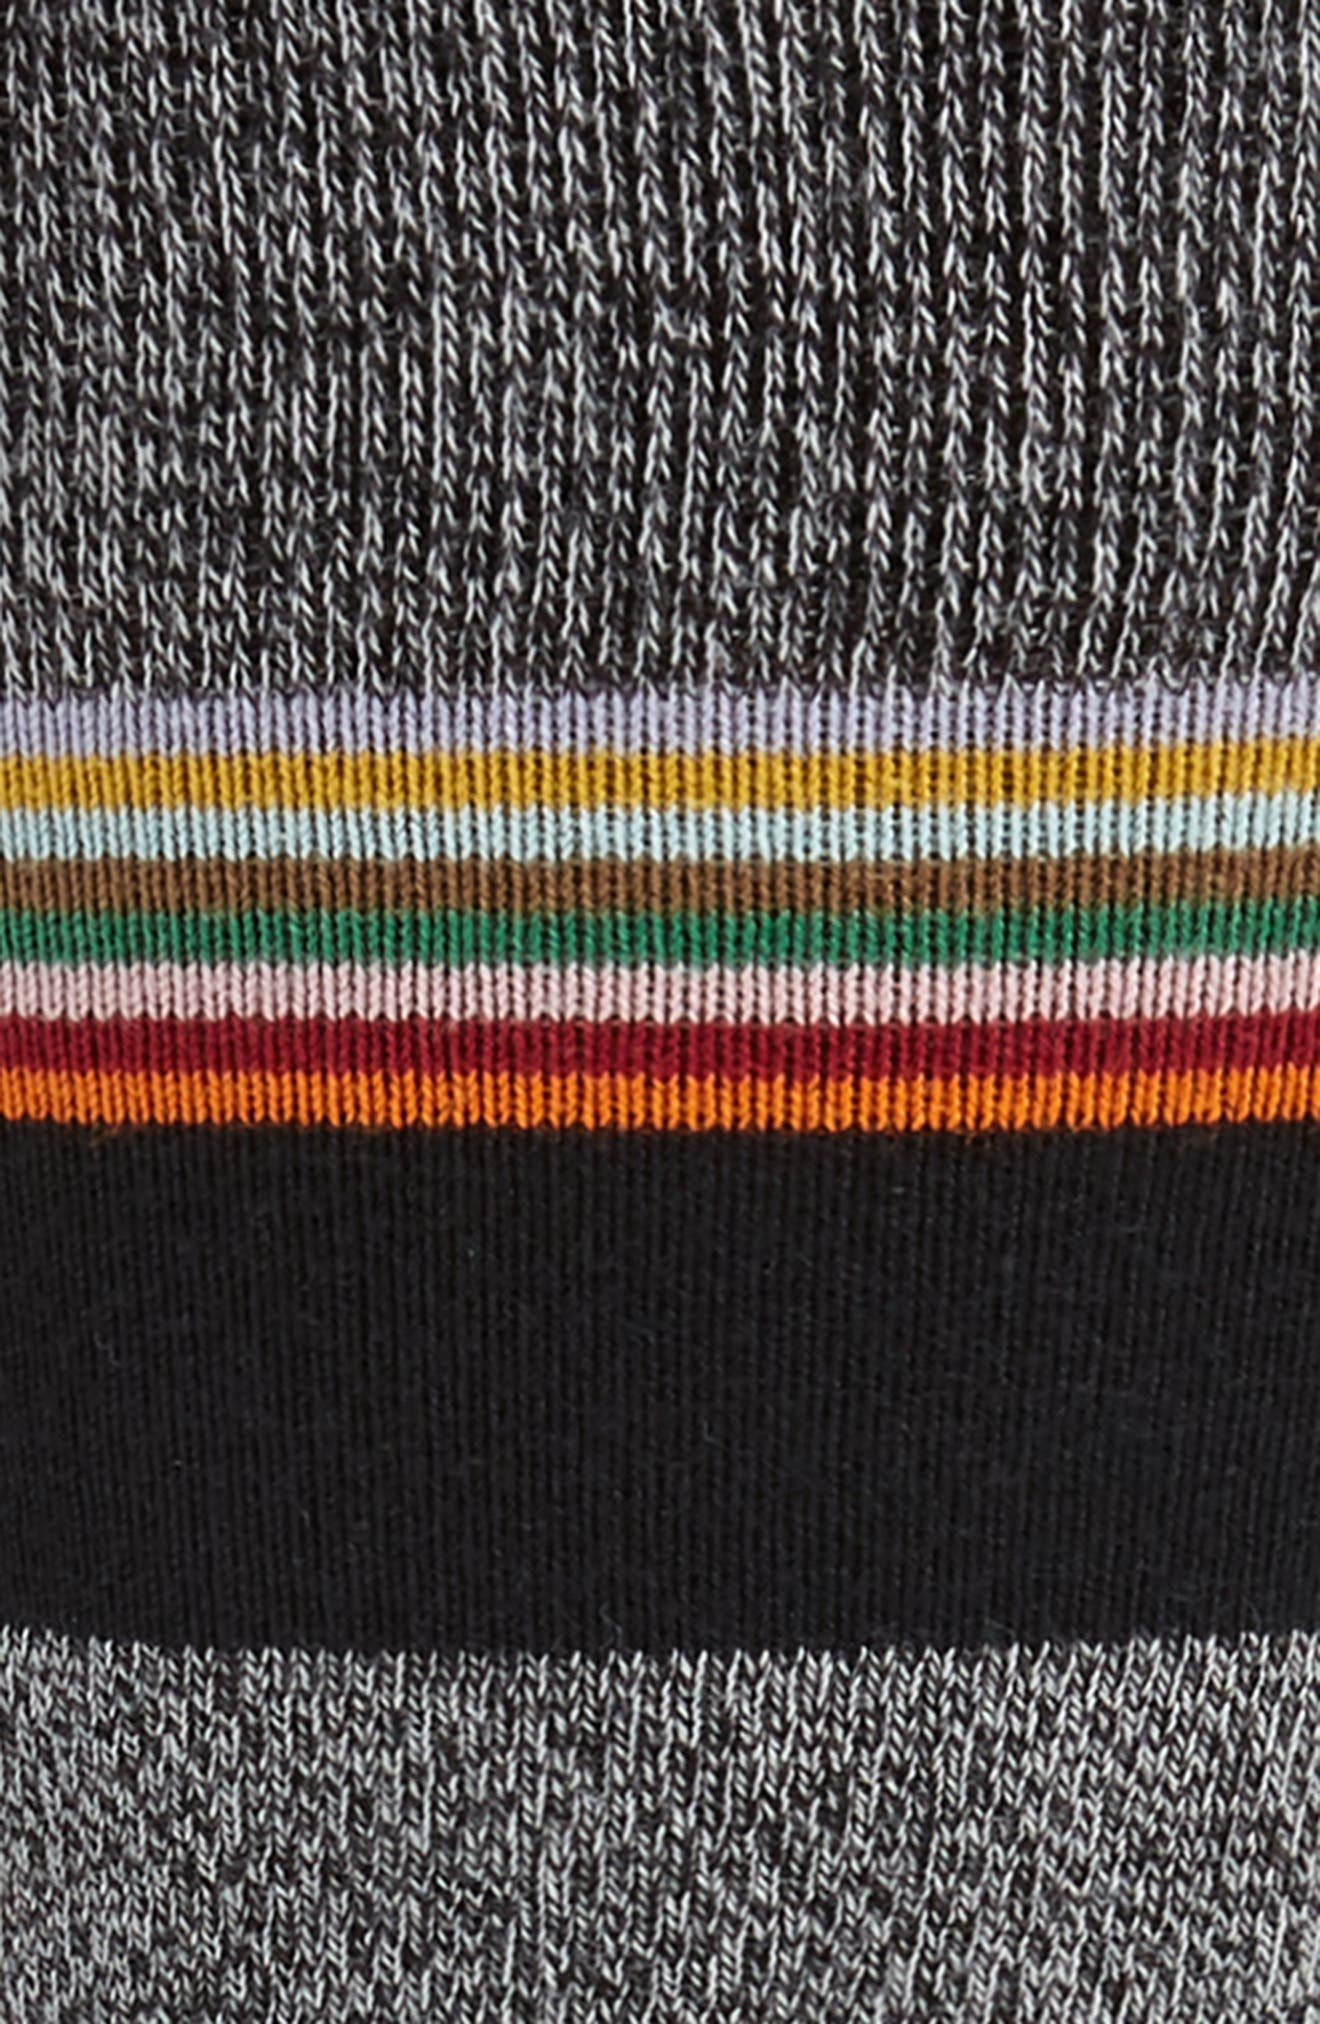 Sol Stripe Socks,                             Alternate thumbnail 2, color,                             BLACK/ GREY/ BLUE